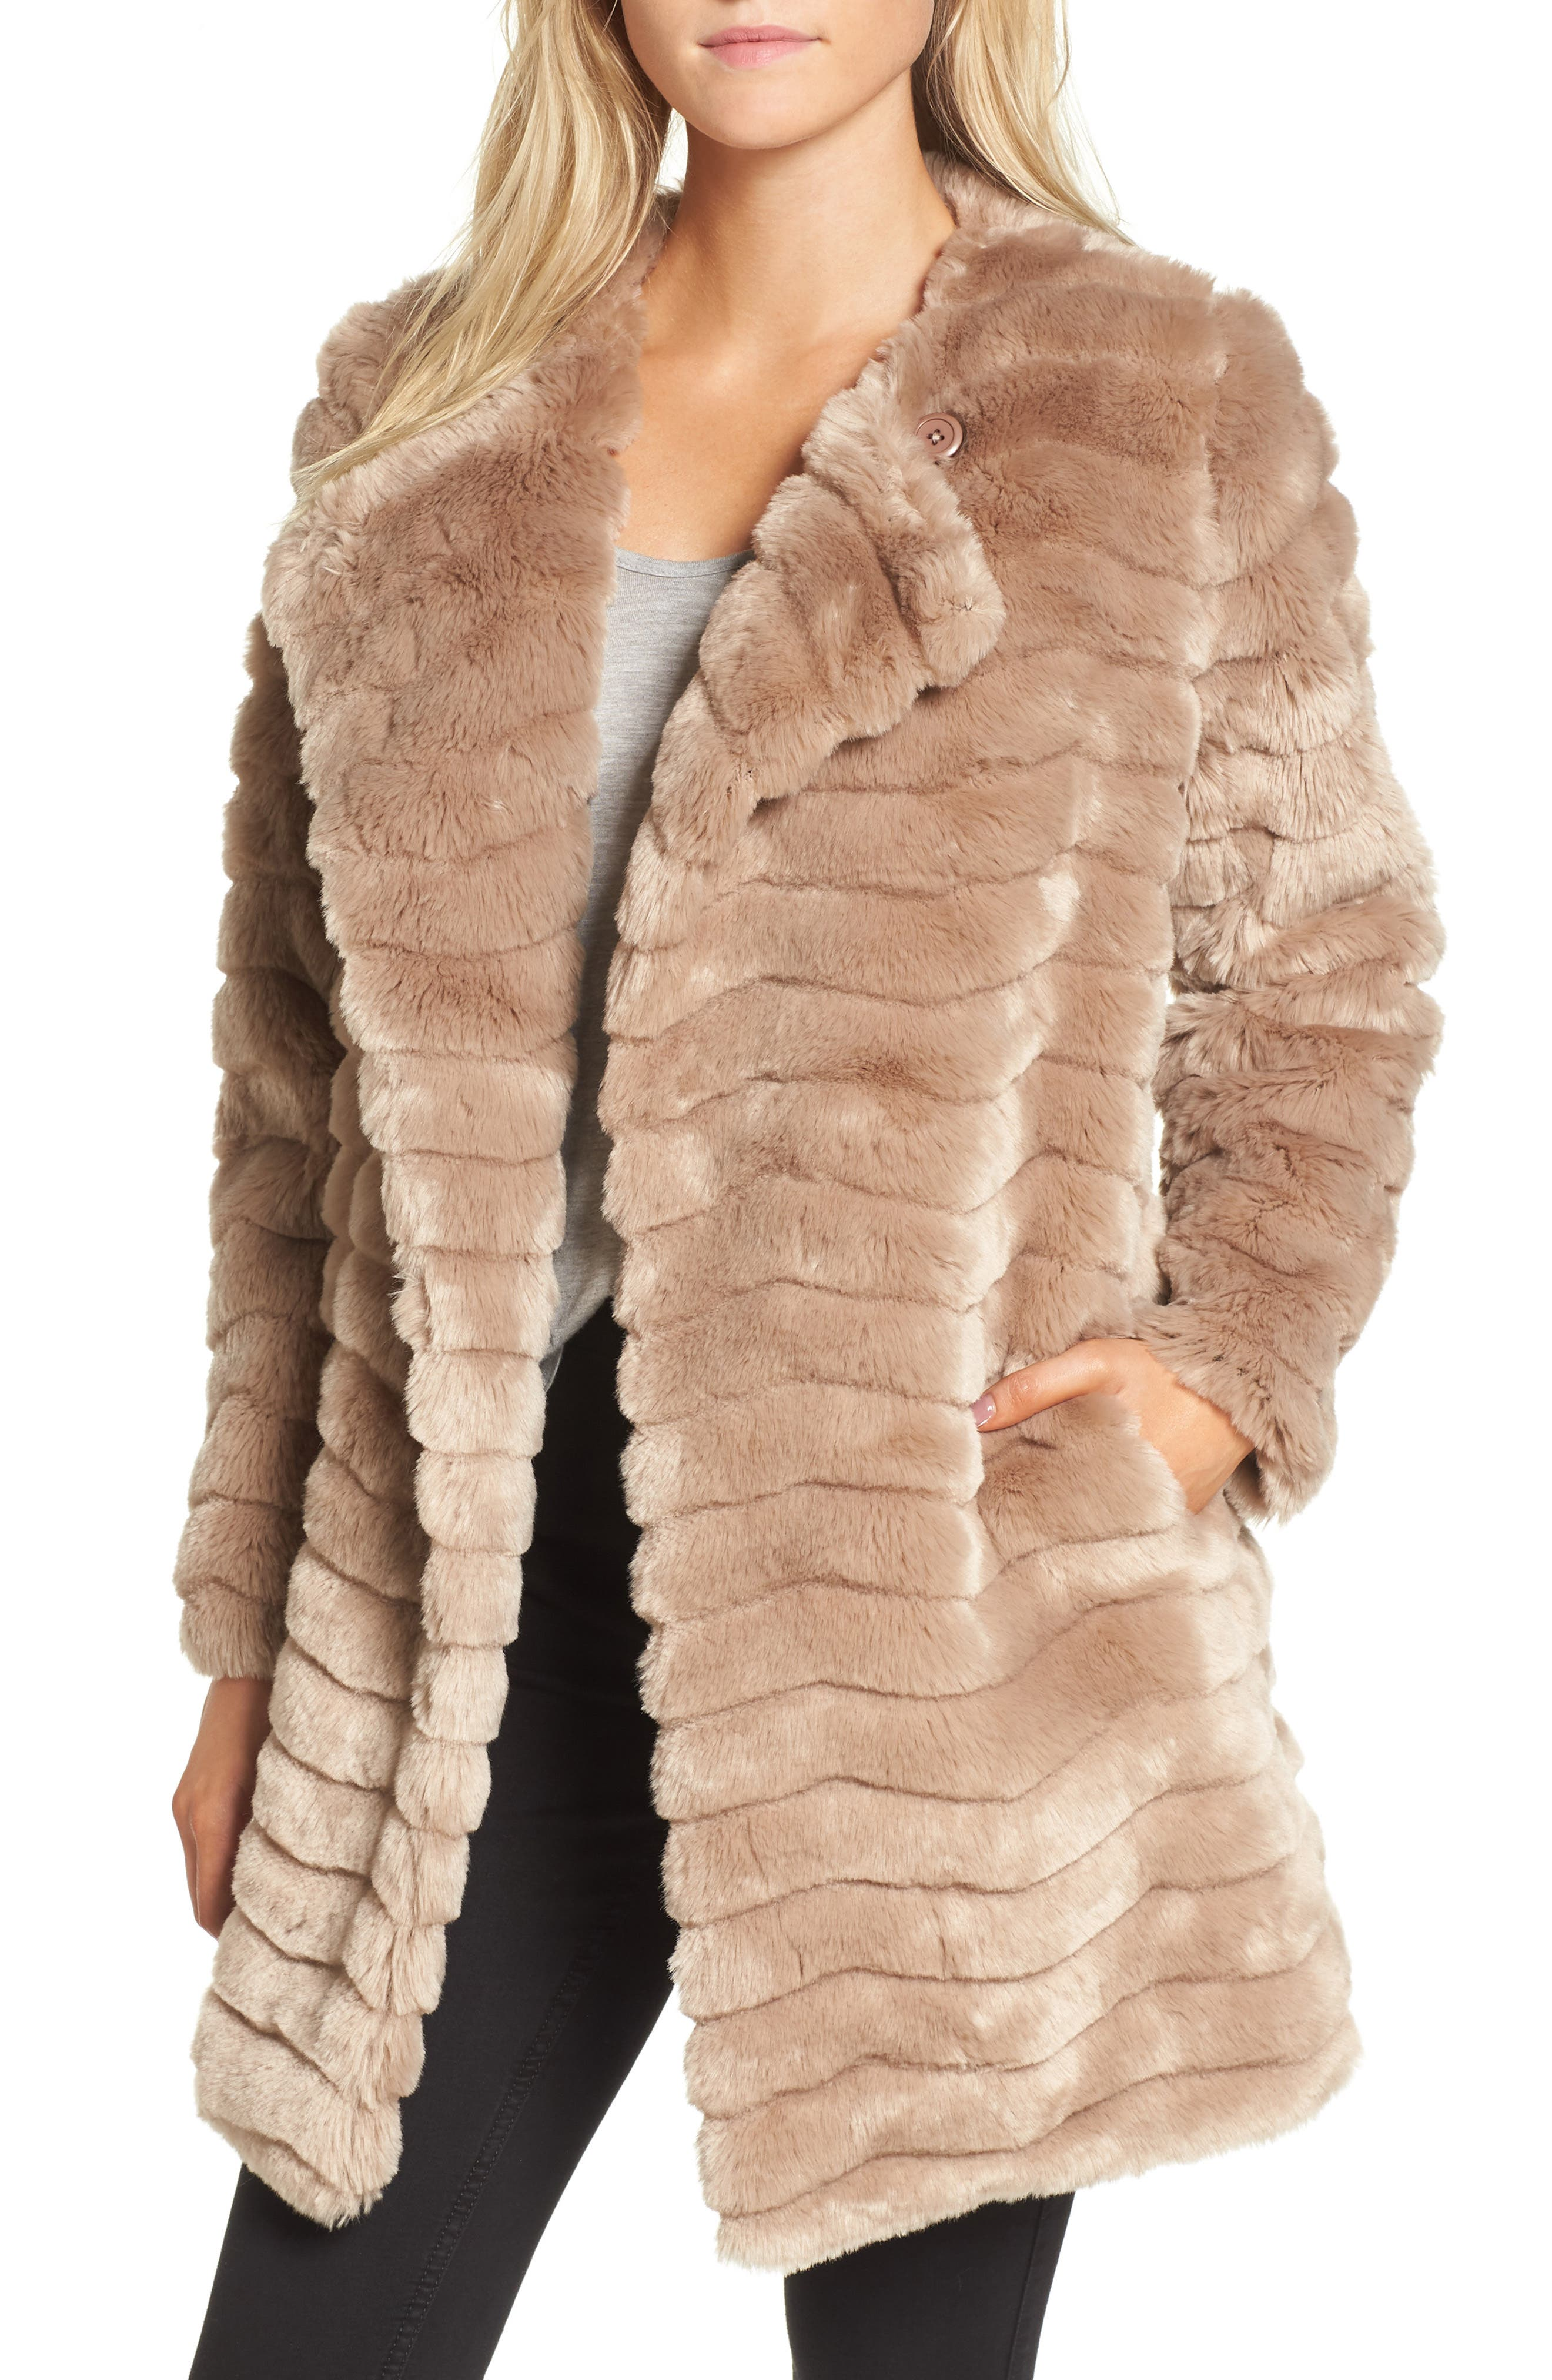 McCoy Faux Fur Coat,                             Main thumbnail 1, color,                             Camel